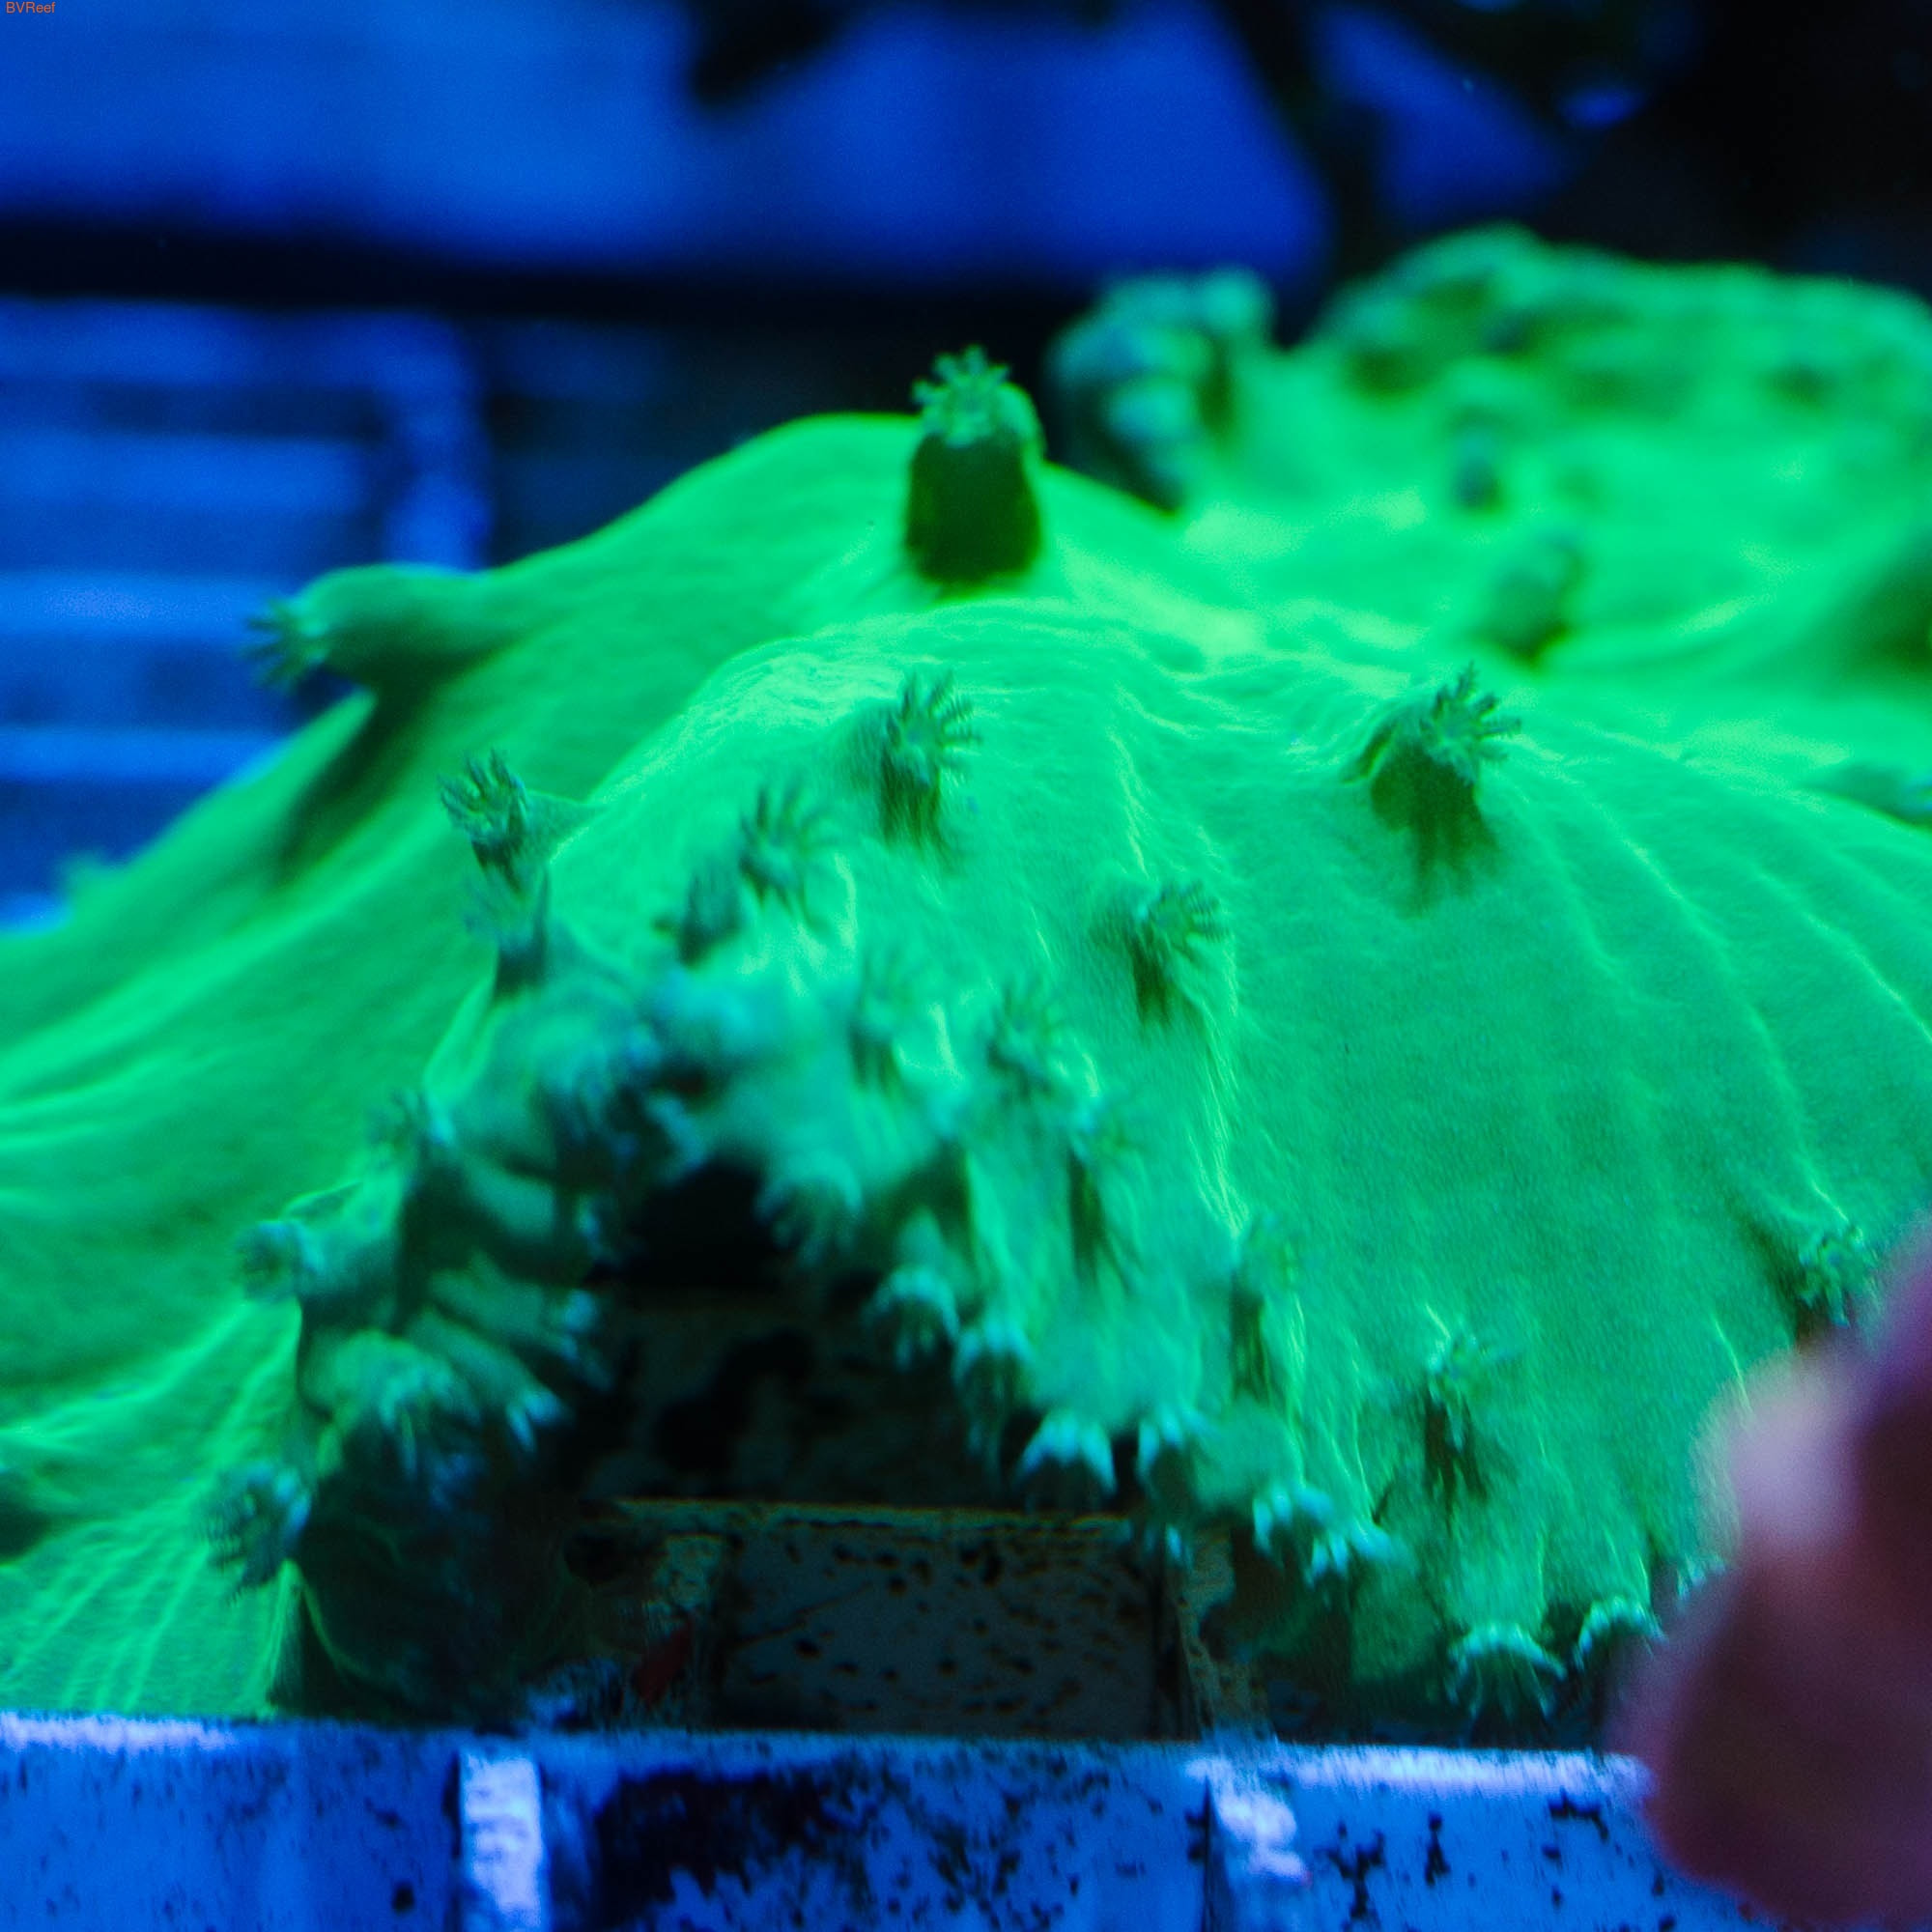 МК20 Синулярия ультра зеленая (Австралия)